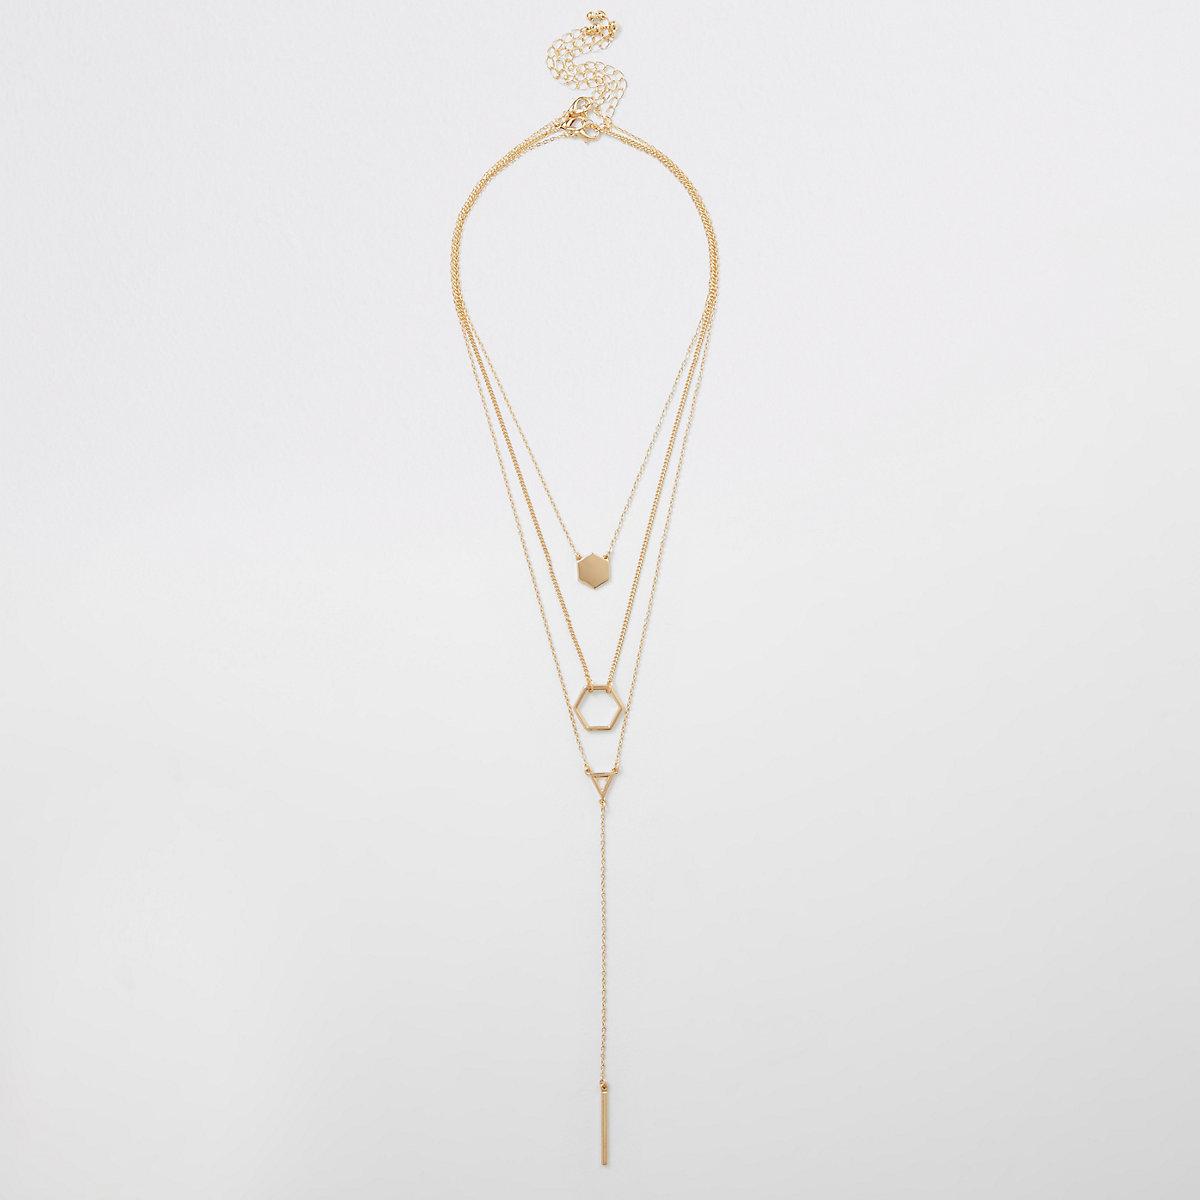 Gold color hexagonal pendant necklace pack